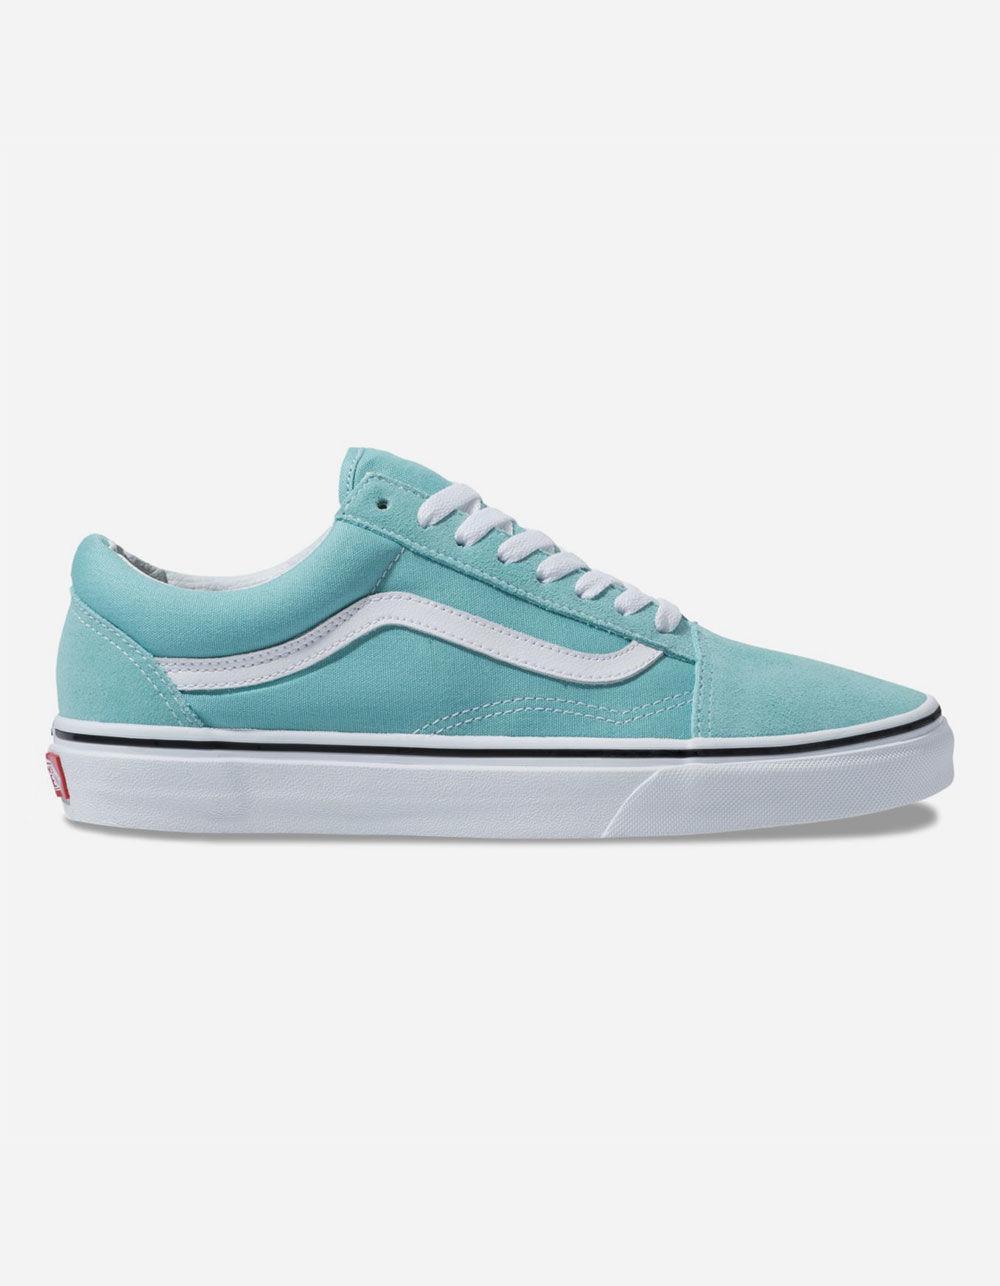 b2fb2cbbbbbae4 Vans. Women s Old Skool Aqua Haze   True White Shoes